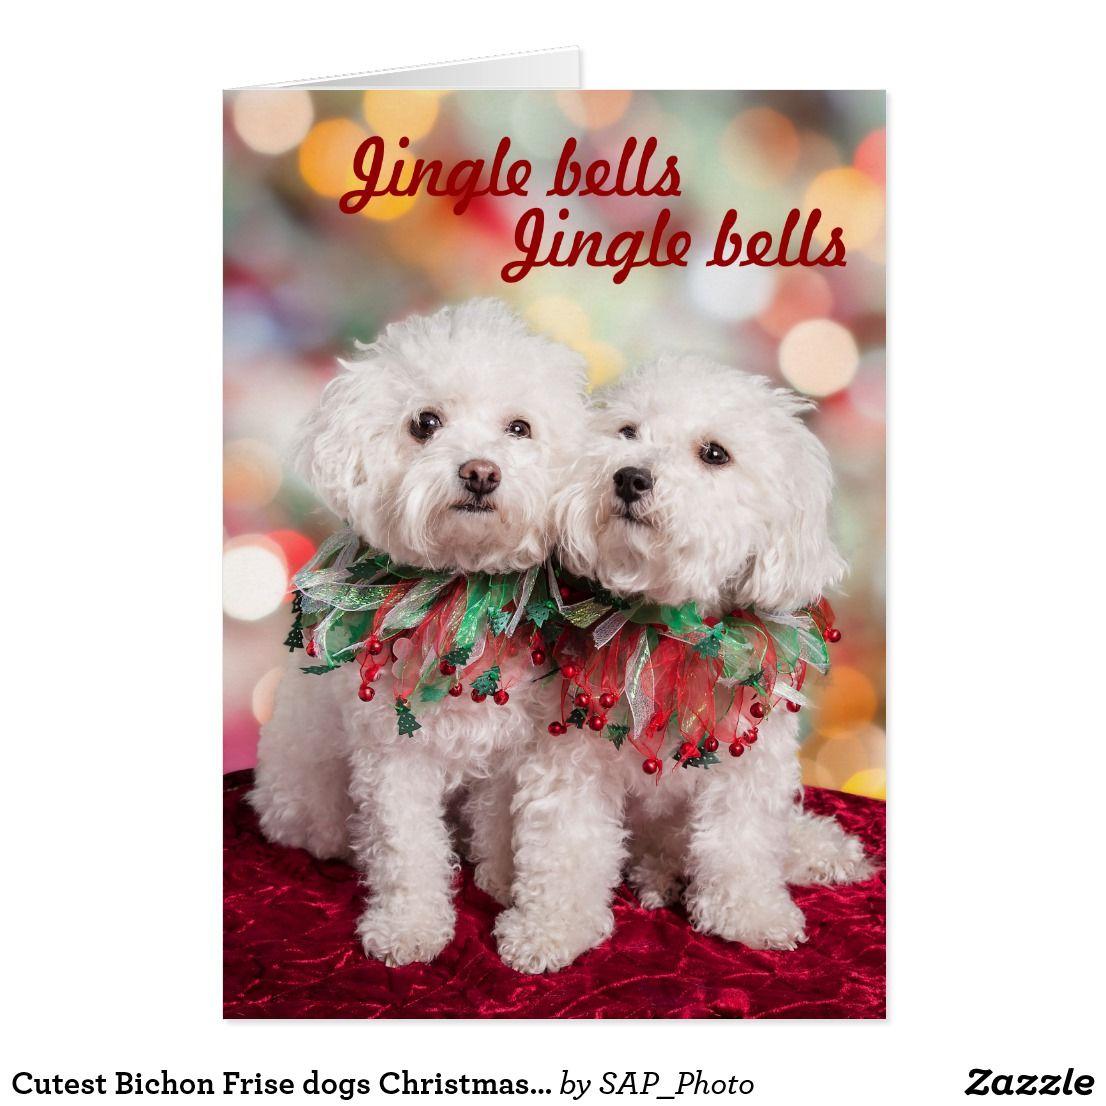 Cutest Bichon Frise Dogs Christmas Card Bichon Frise Dog And Cat